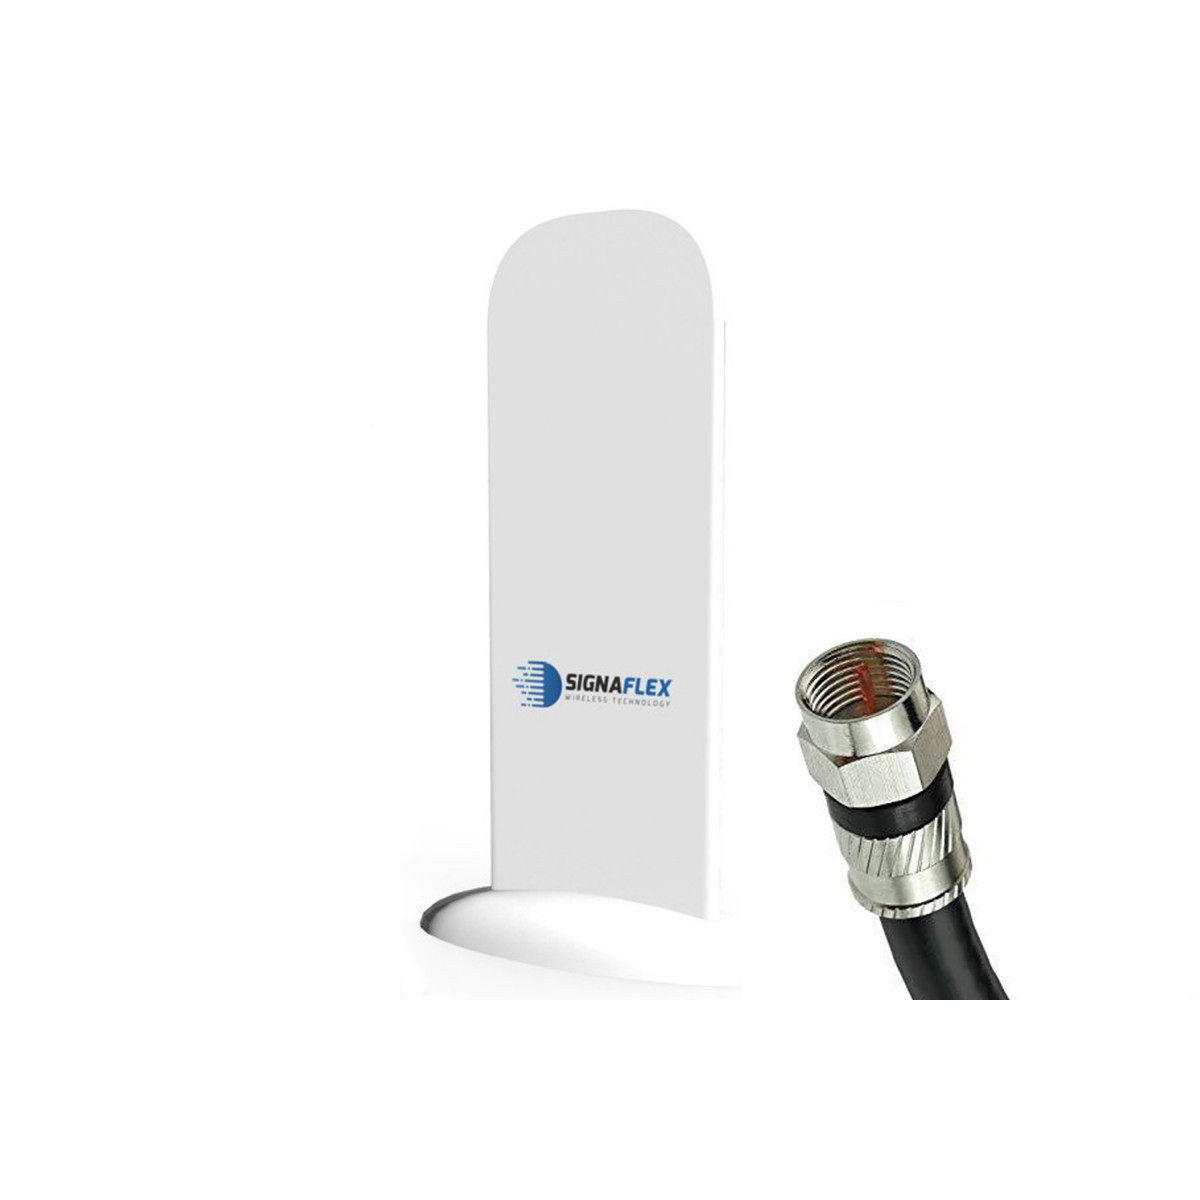 Antena Omni 3G / 4G 32 dBi 6 m Fm